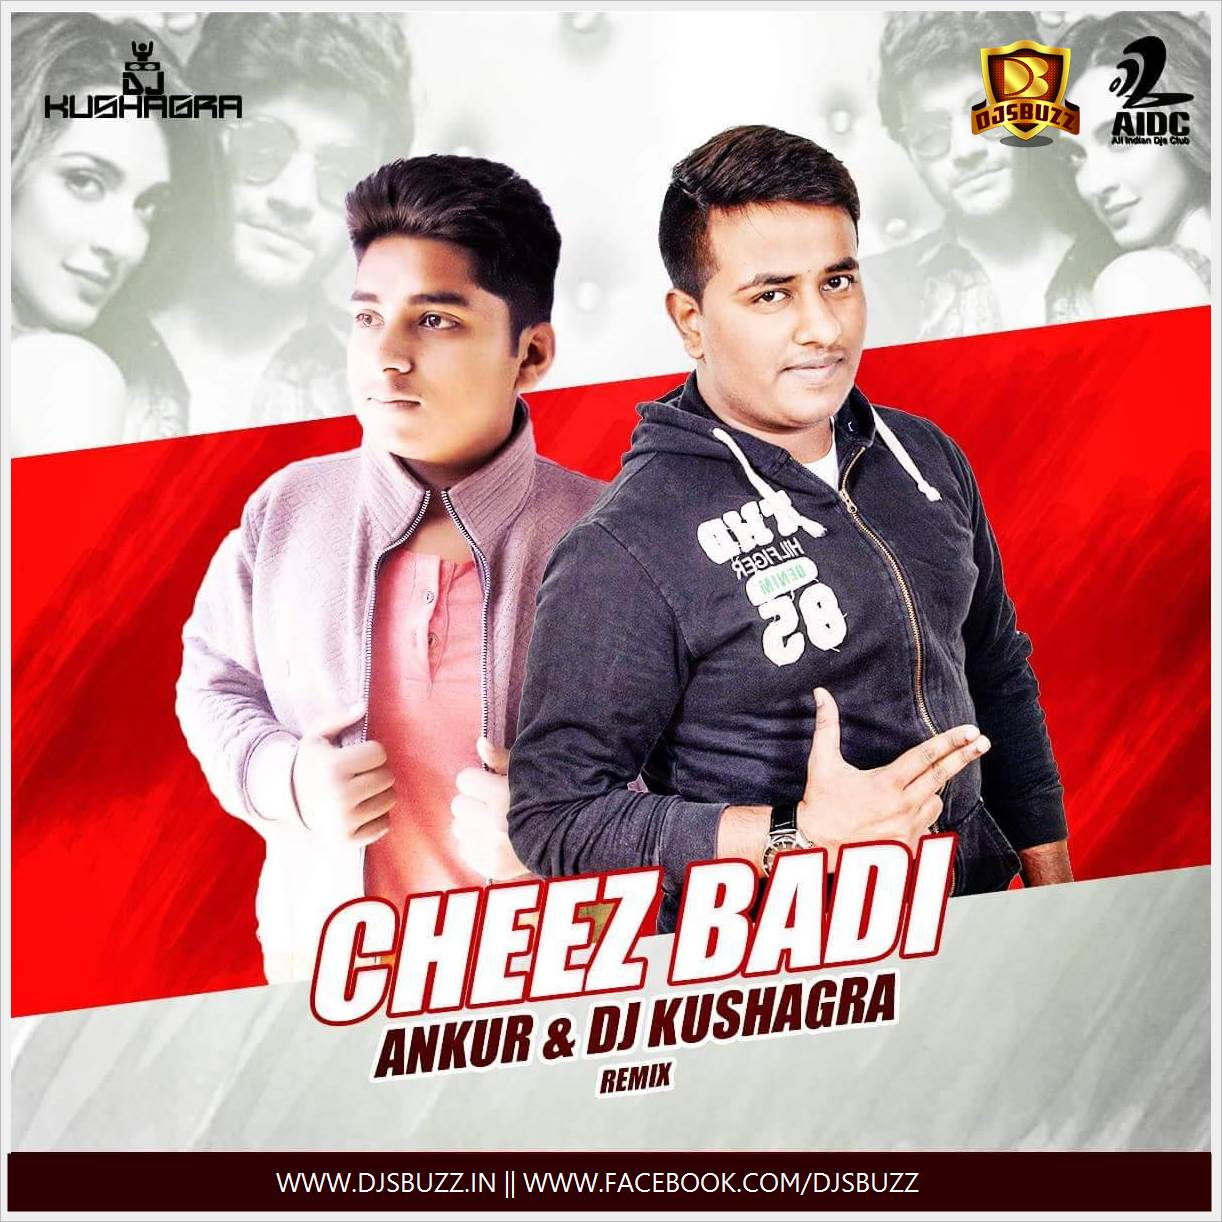 Tu Cheez Badi Download 2017: ANKUR & DJ Kushagra